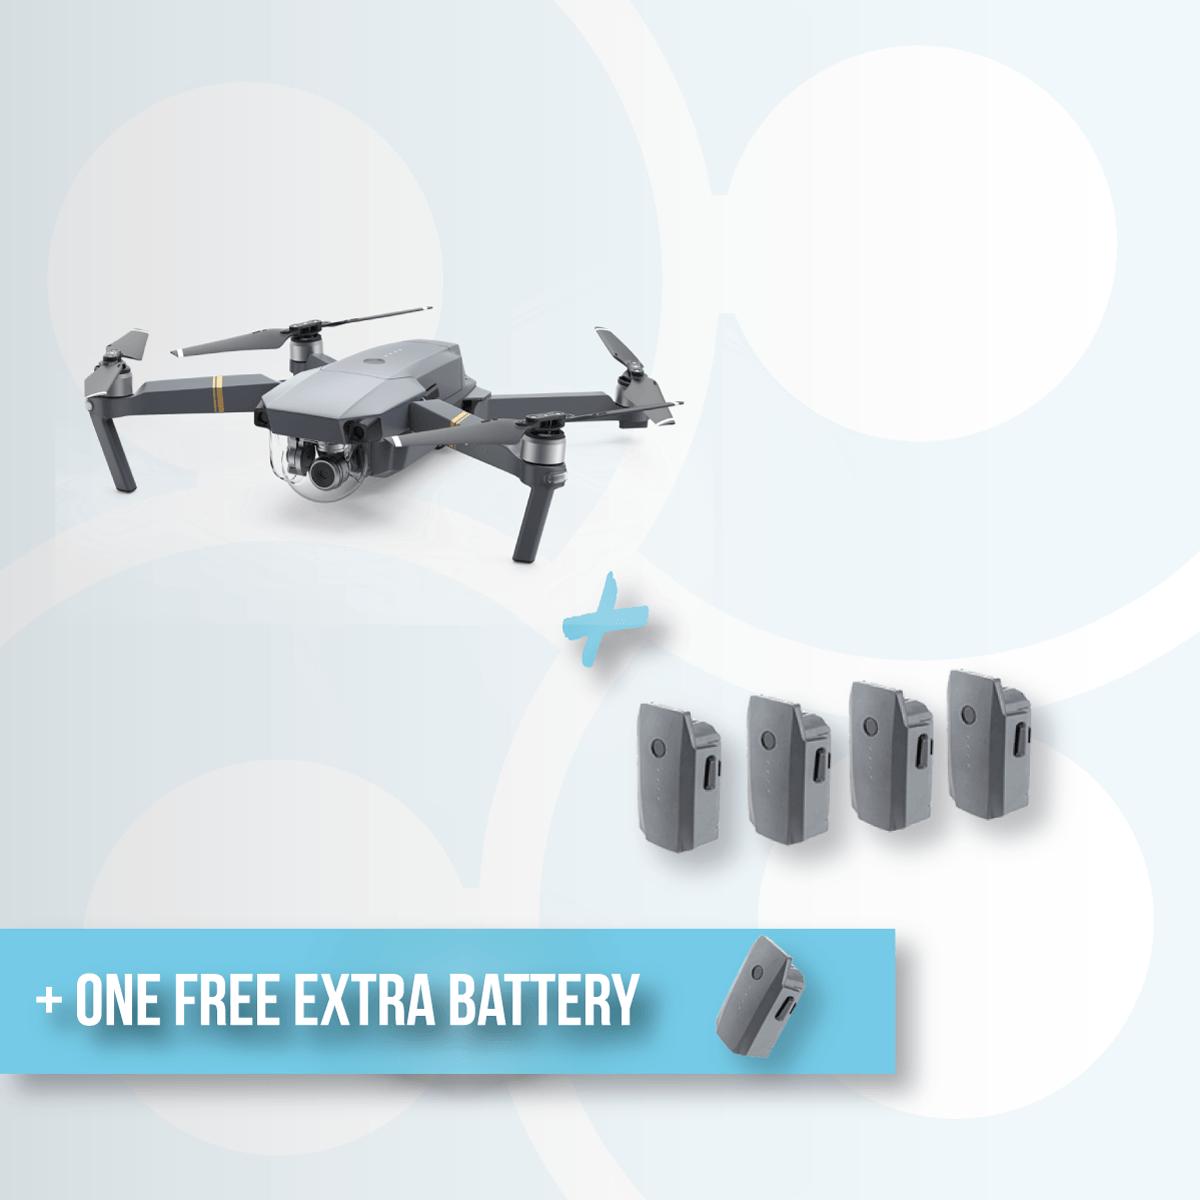 Mavic-bundle-Extra-battery-free-swagbag-good-value